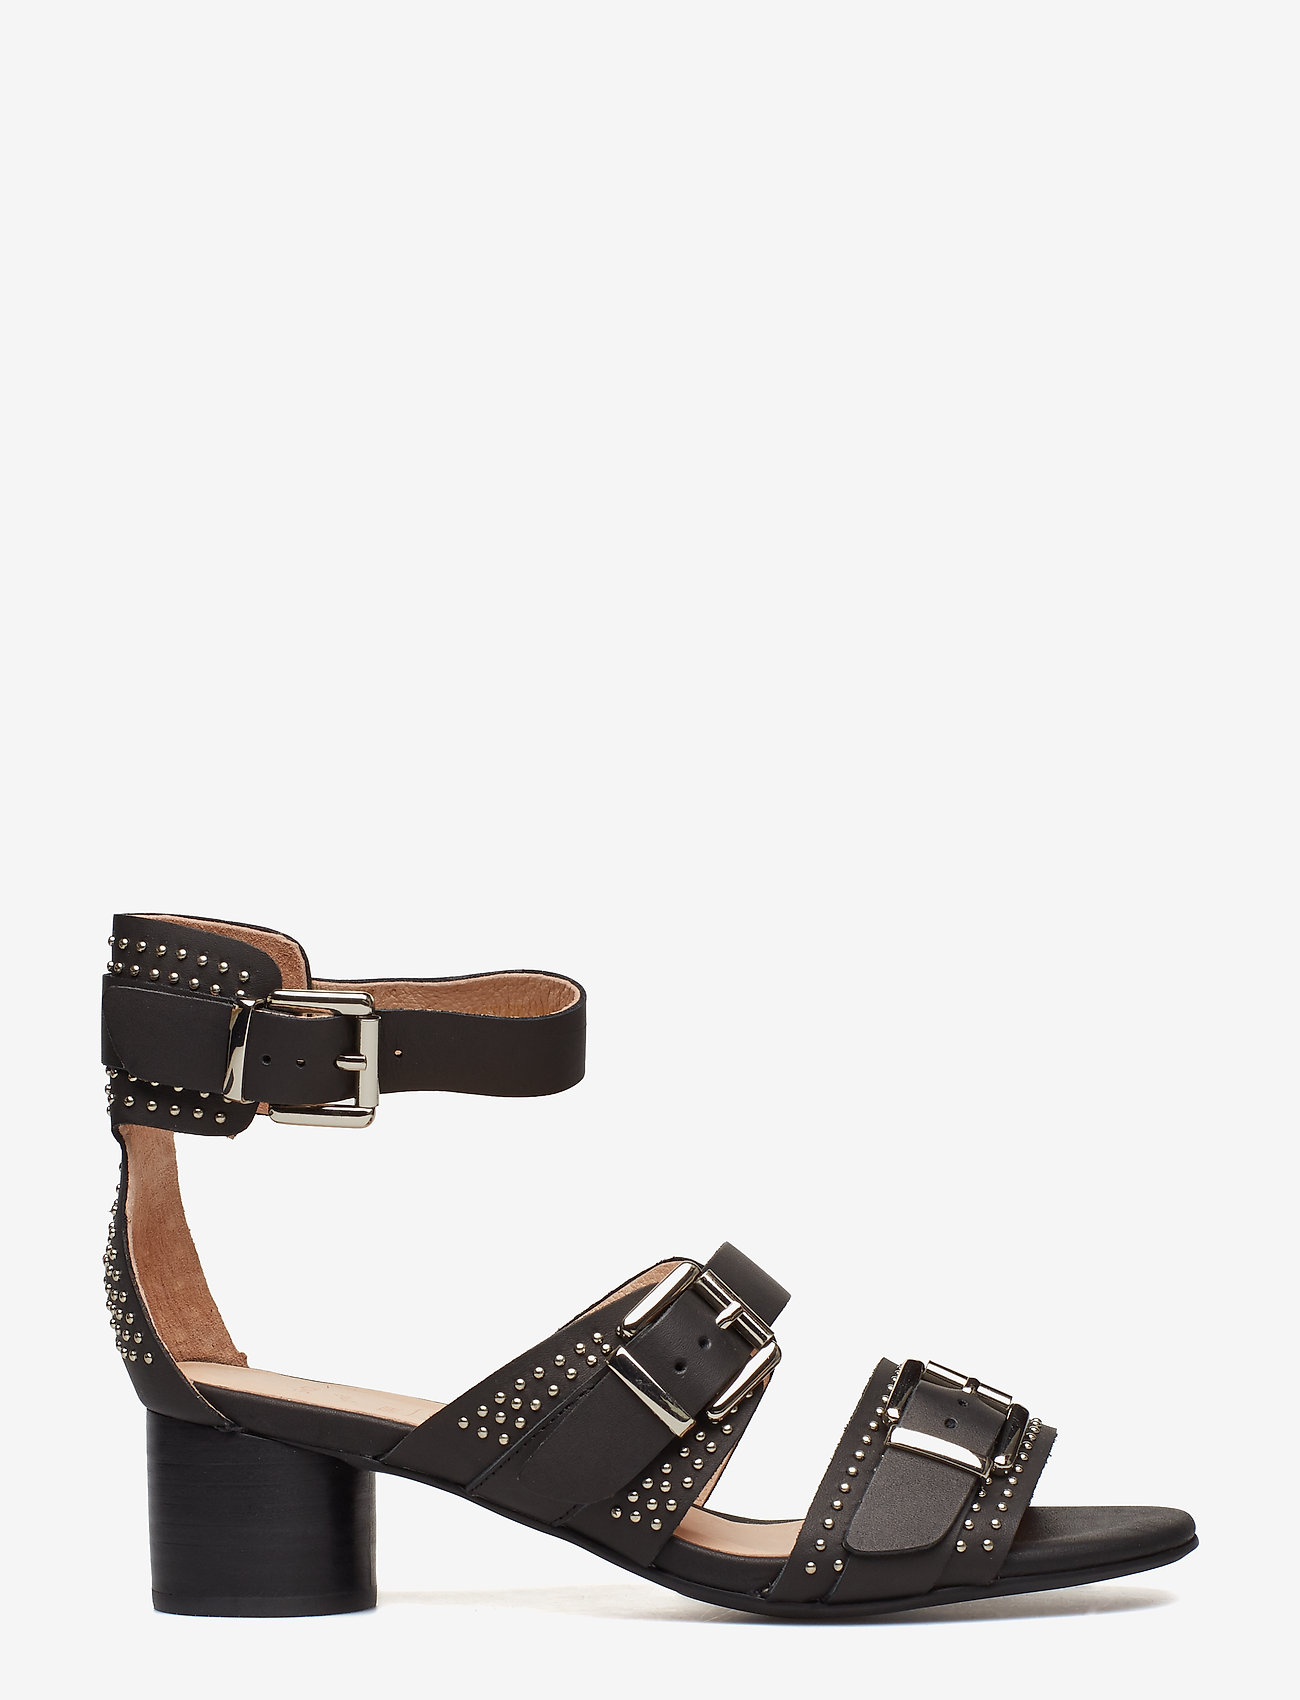 Aya Studs Sandal (Black) - Shoe The Bear